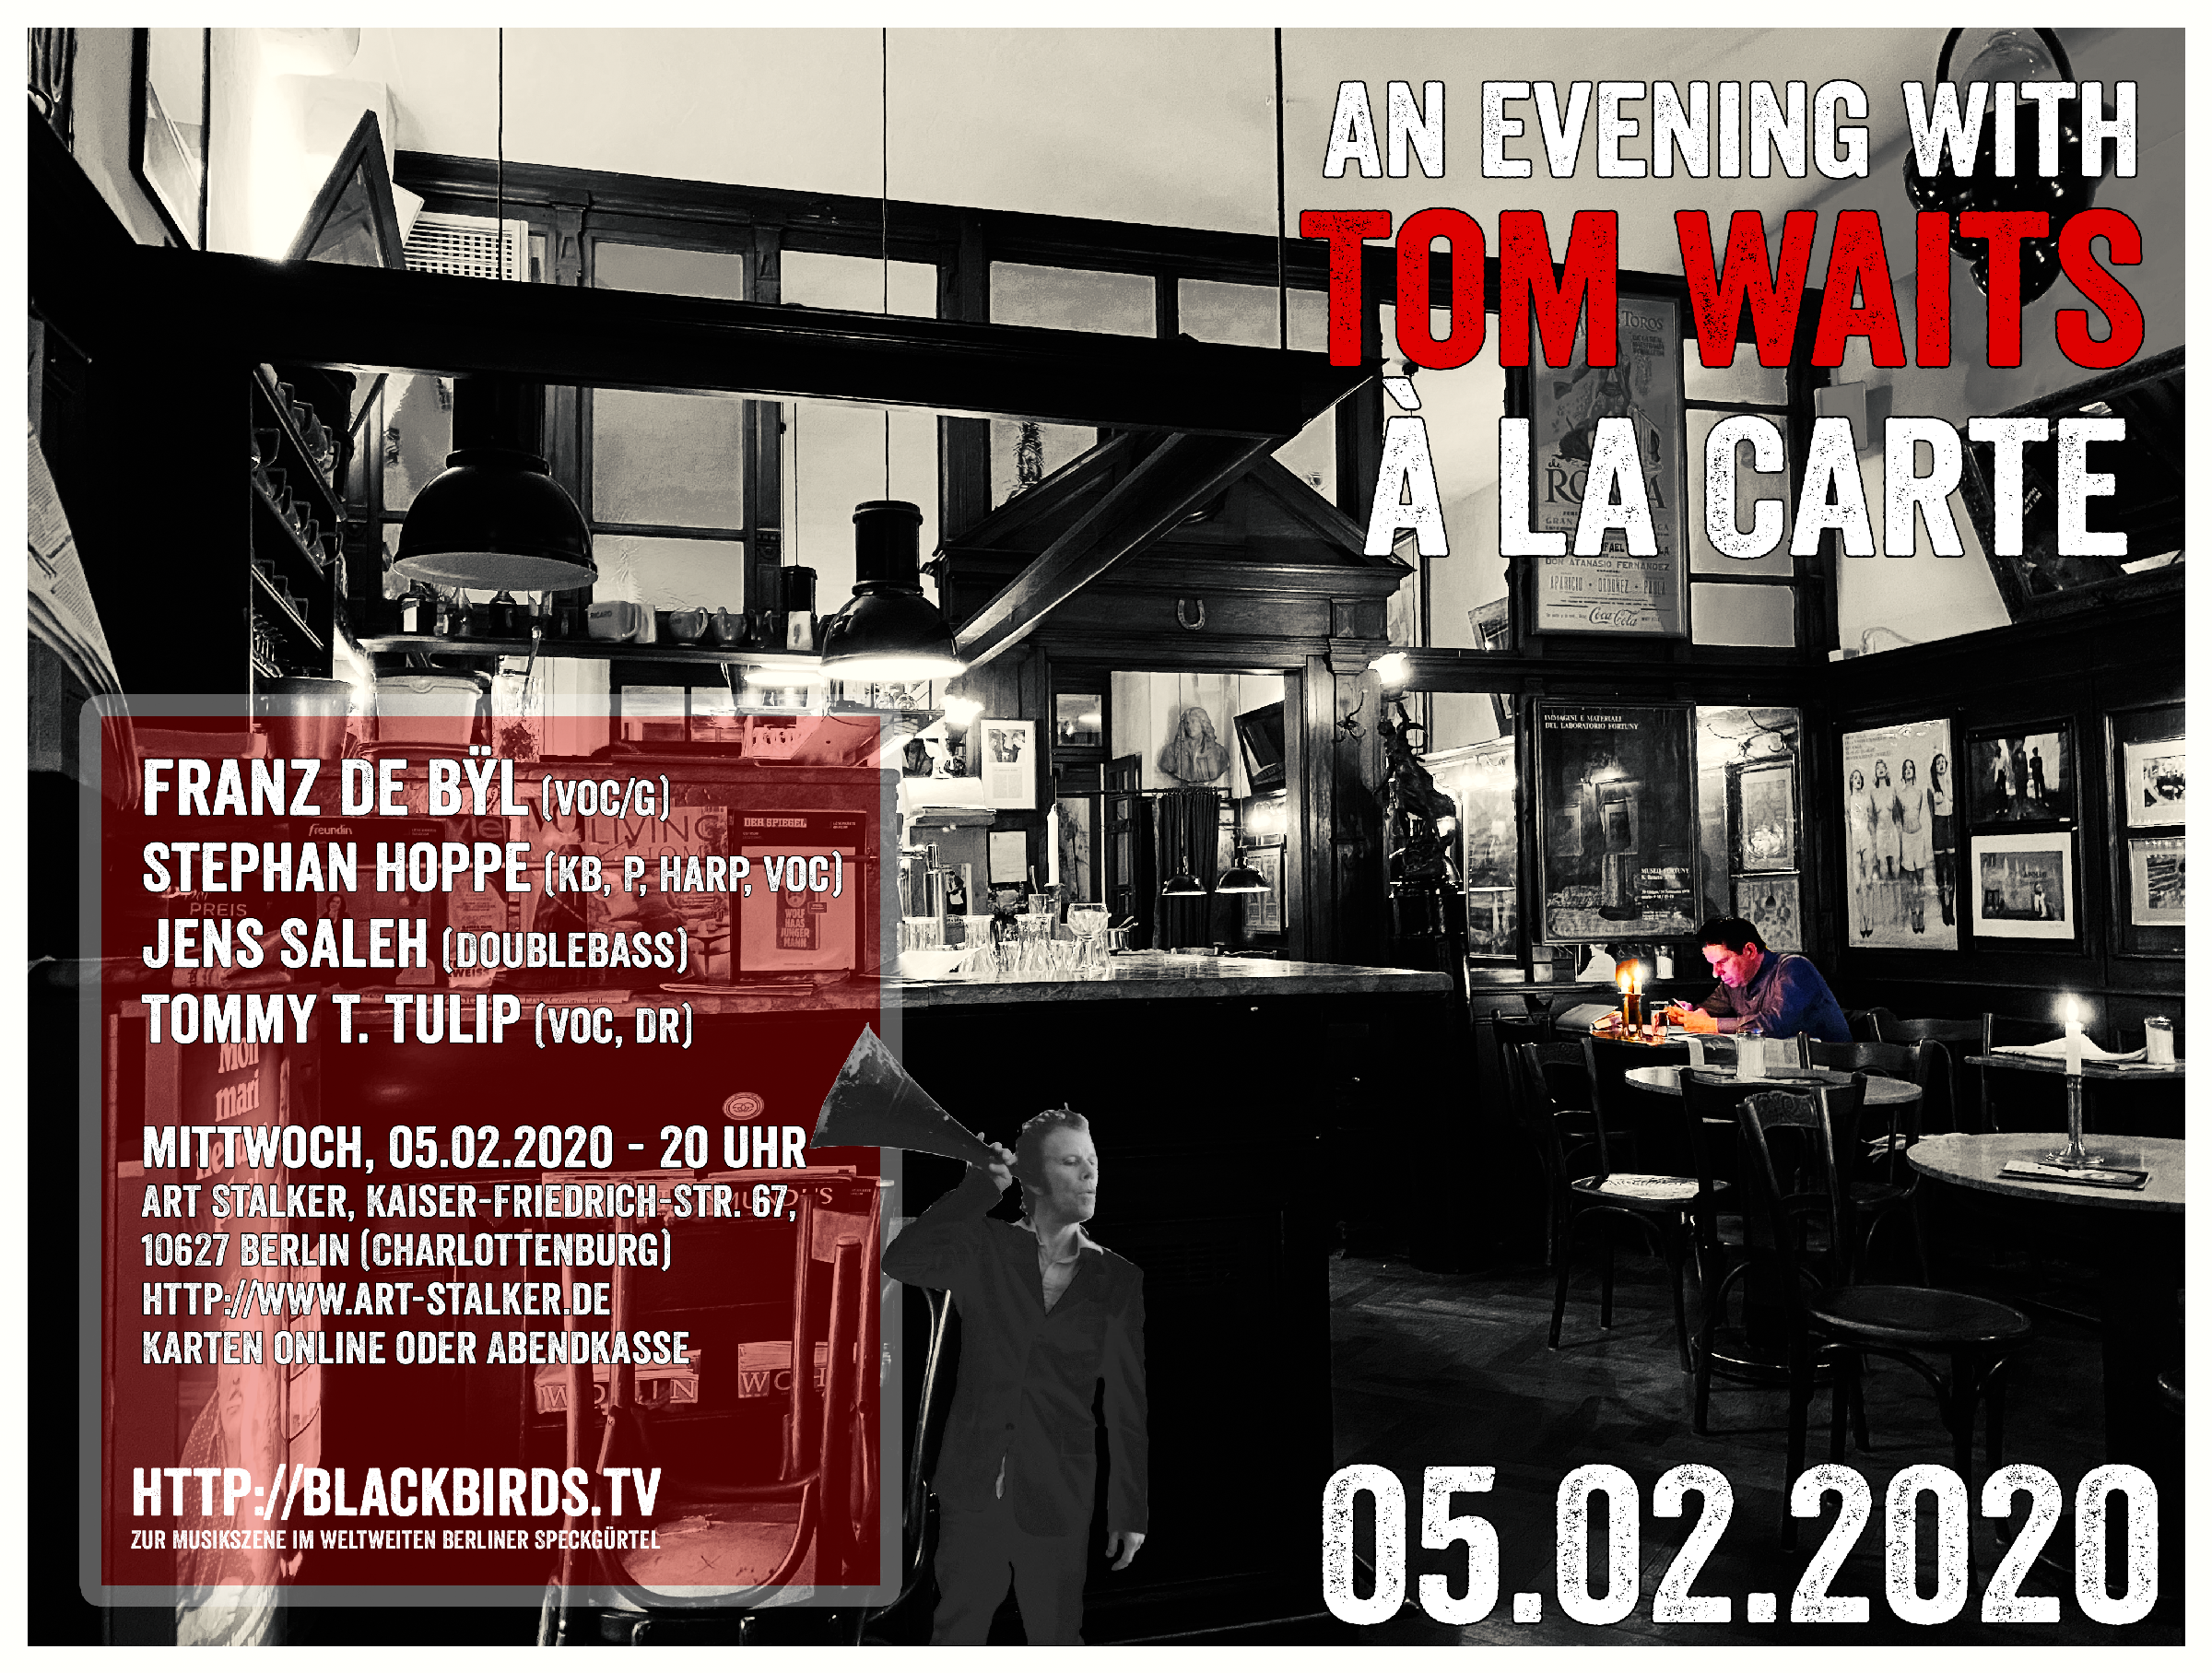 Tom Waits à la Carte - 05.02.2020 #Veranstaltung #LiveMusik #ArtStalkerBerlin